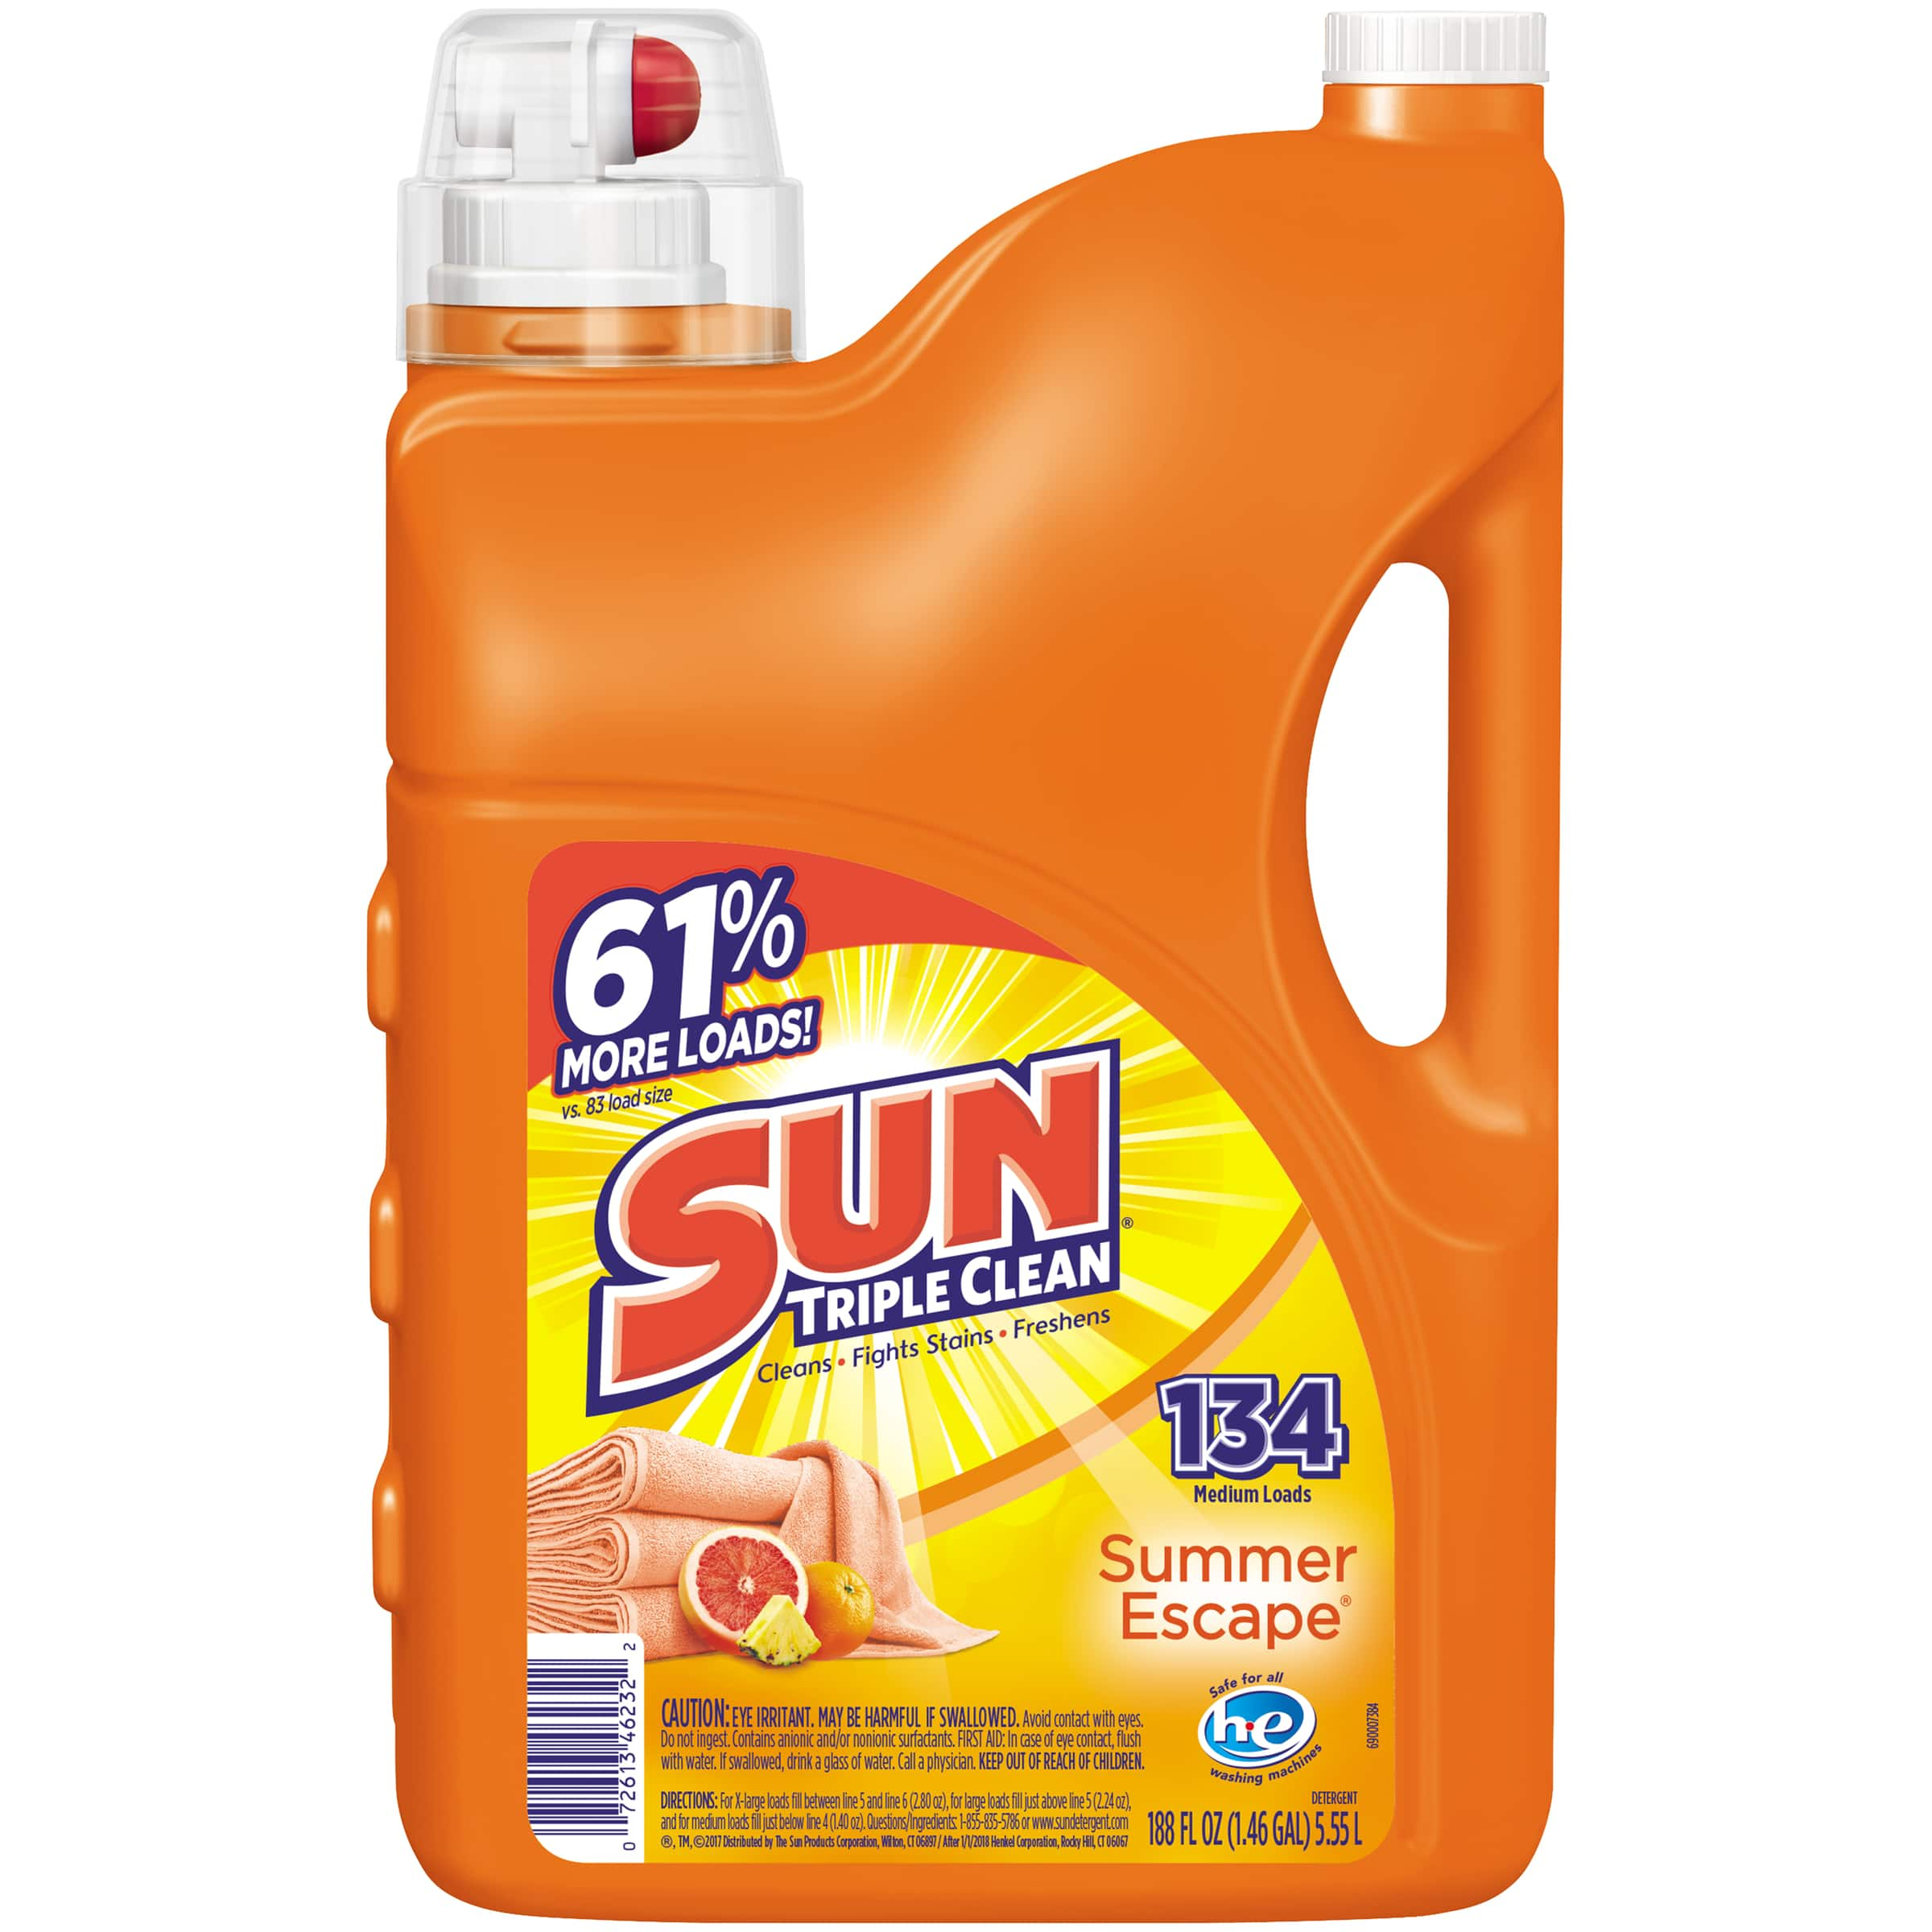 Sun Liquid Laundry Detergent Summer Escape, 188 Ounce, 134 loads, $2.96 at Walmart